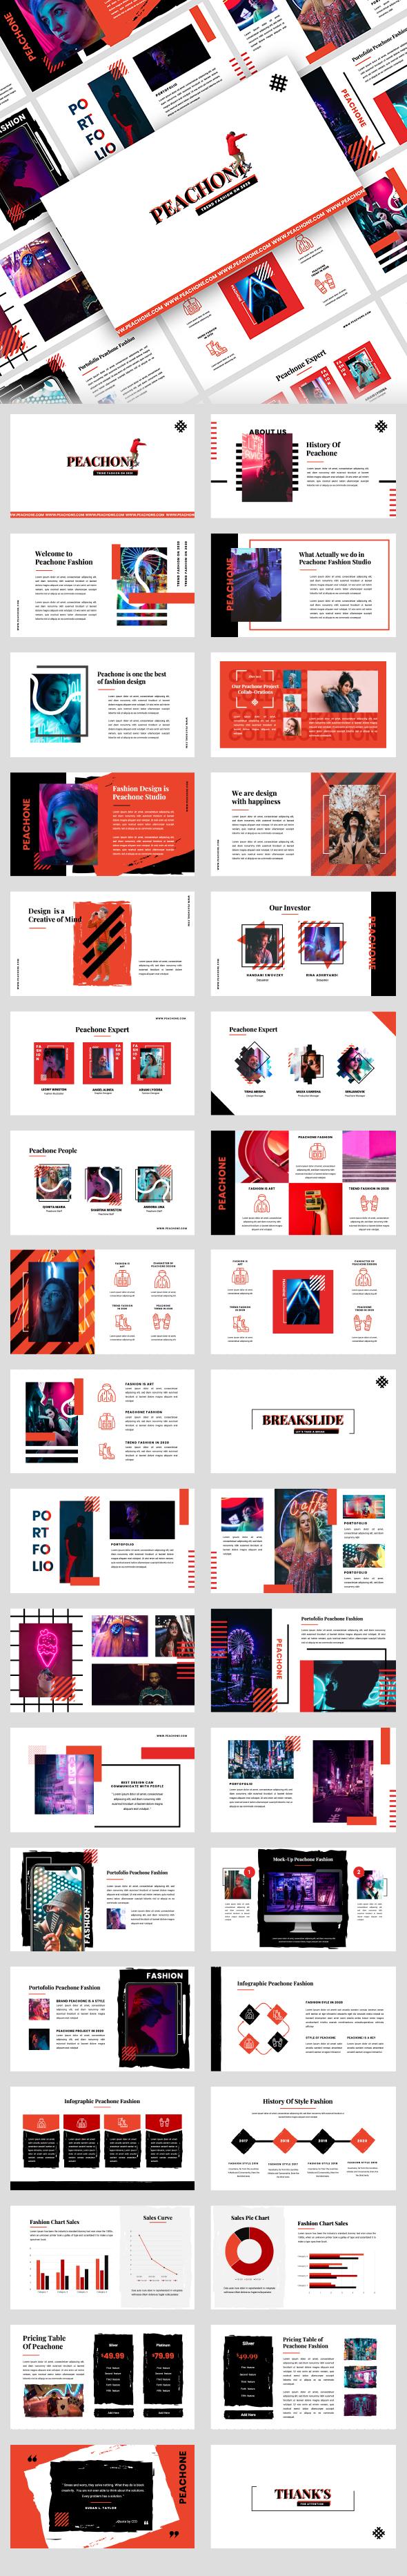 Peachone - Fashion Creative PowerPoint Presentation